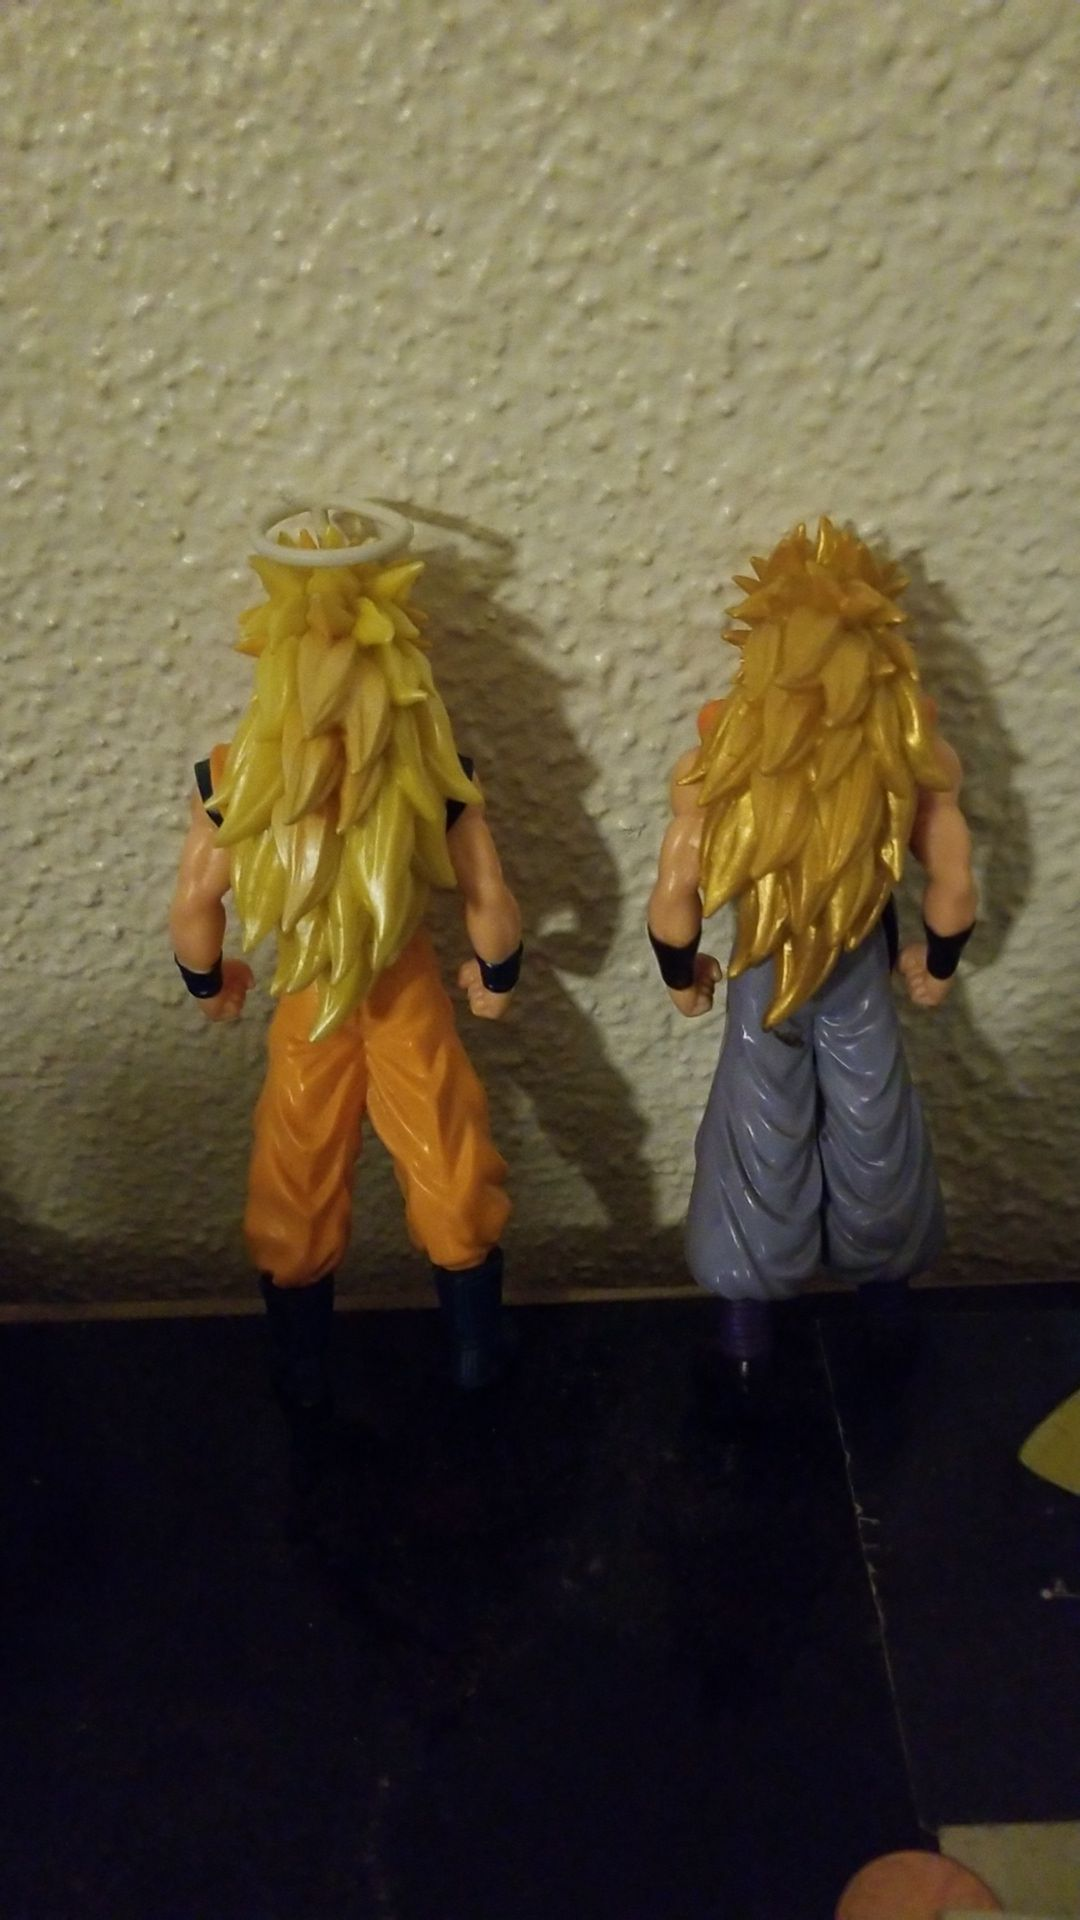 Ssj3 goku and ssj3 gogeta action figures